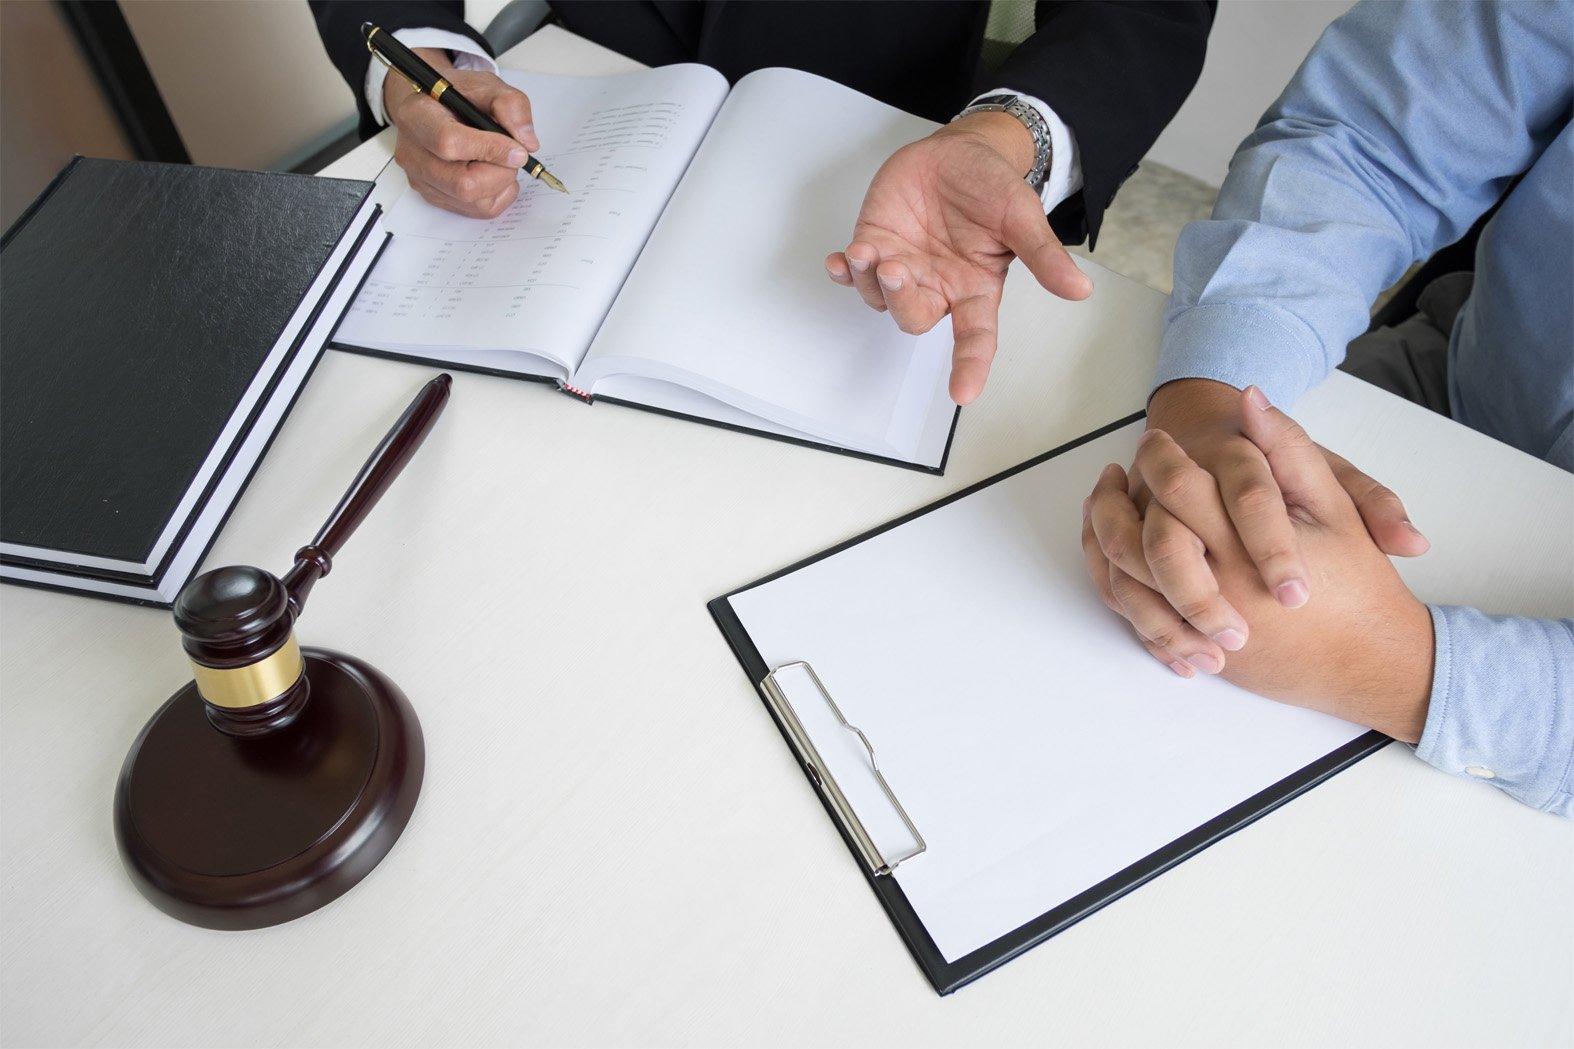 Personal Injury Attorneys Lancaster Palmdale Kuzyk Law